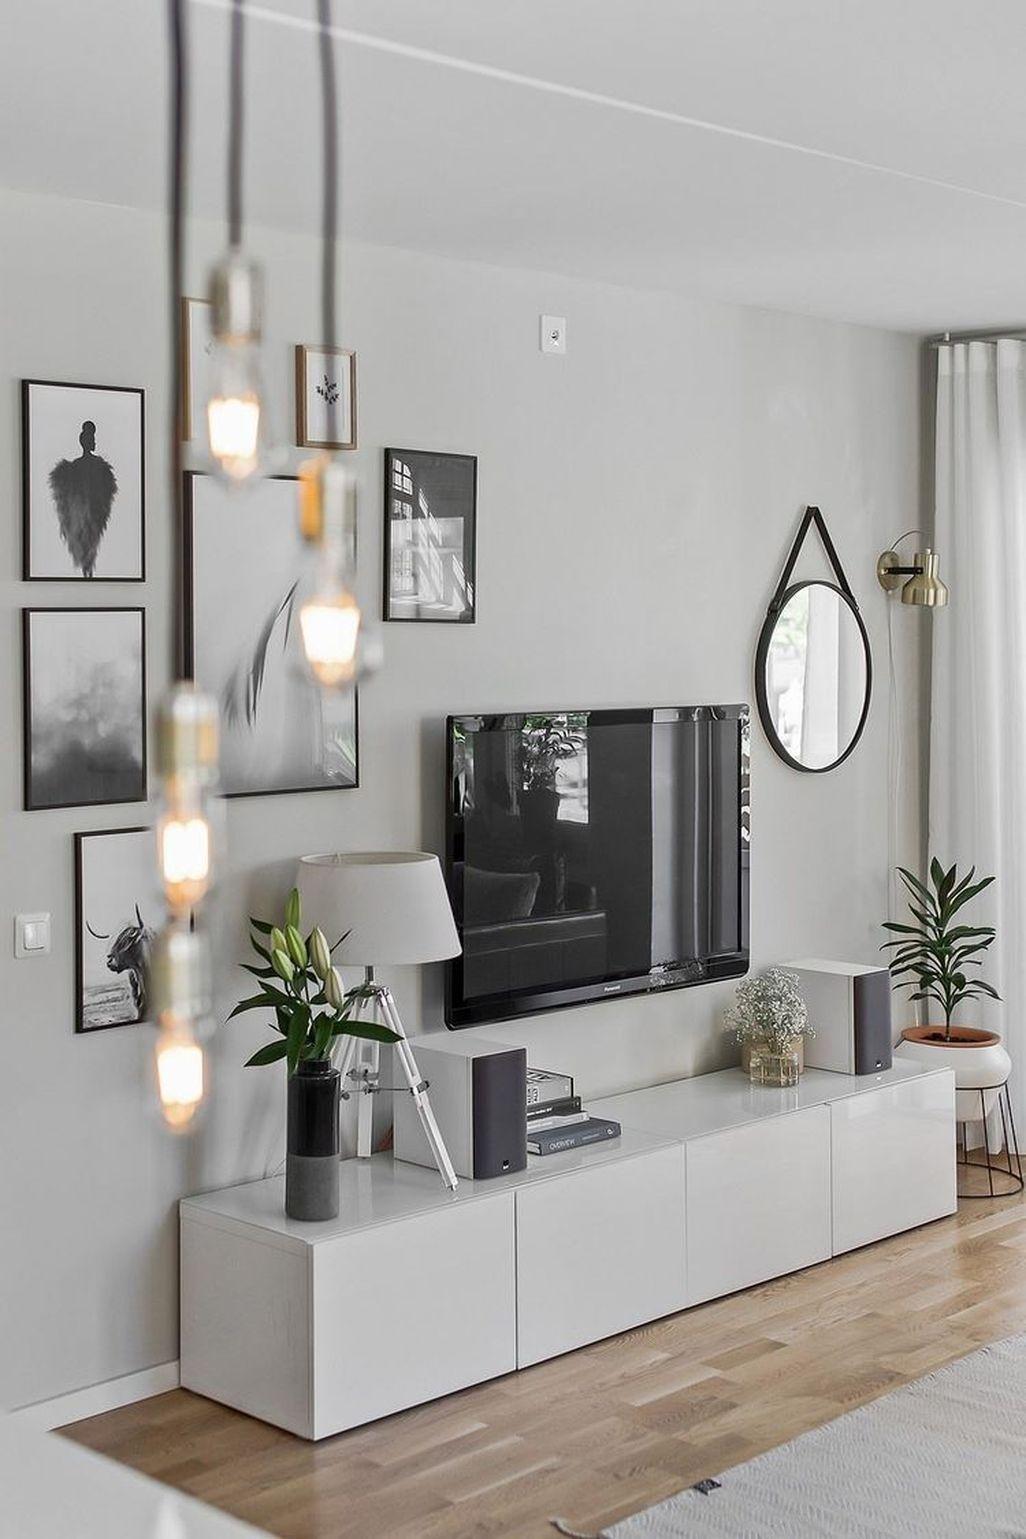 Interior Design Tv Room: Scandinavian Living Room For Home